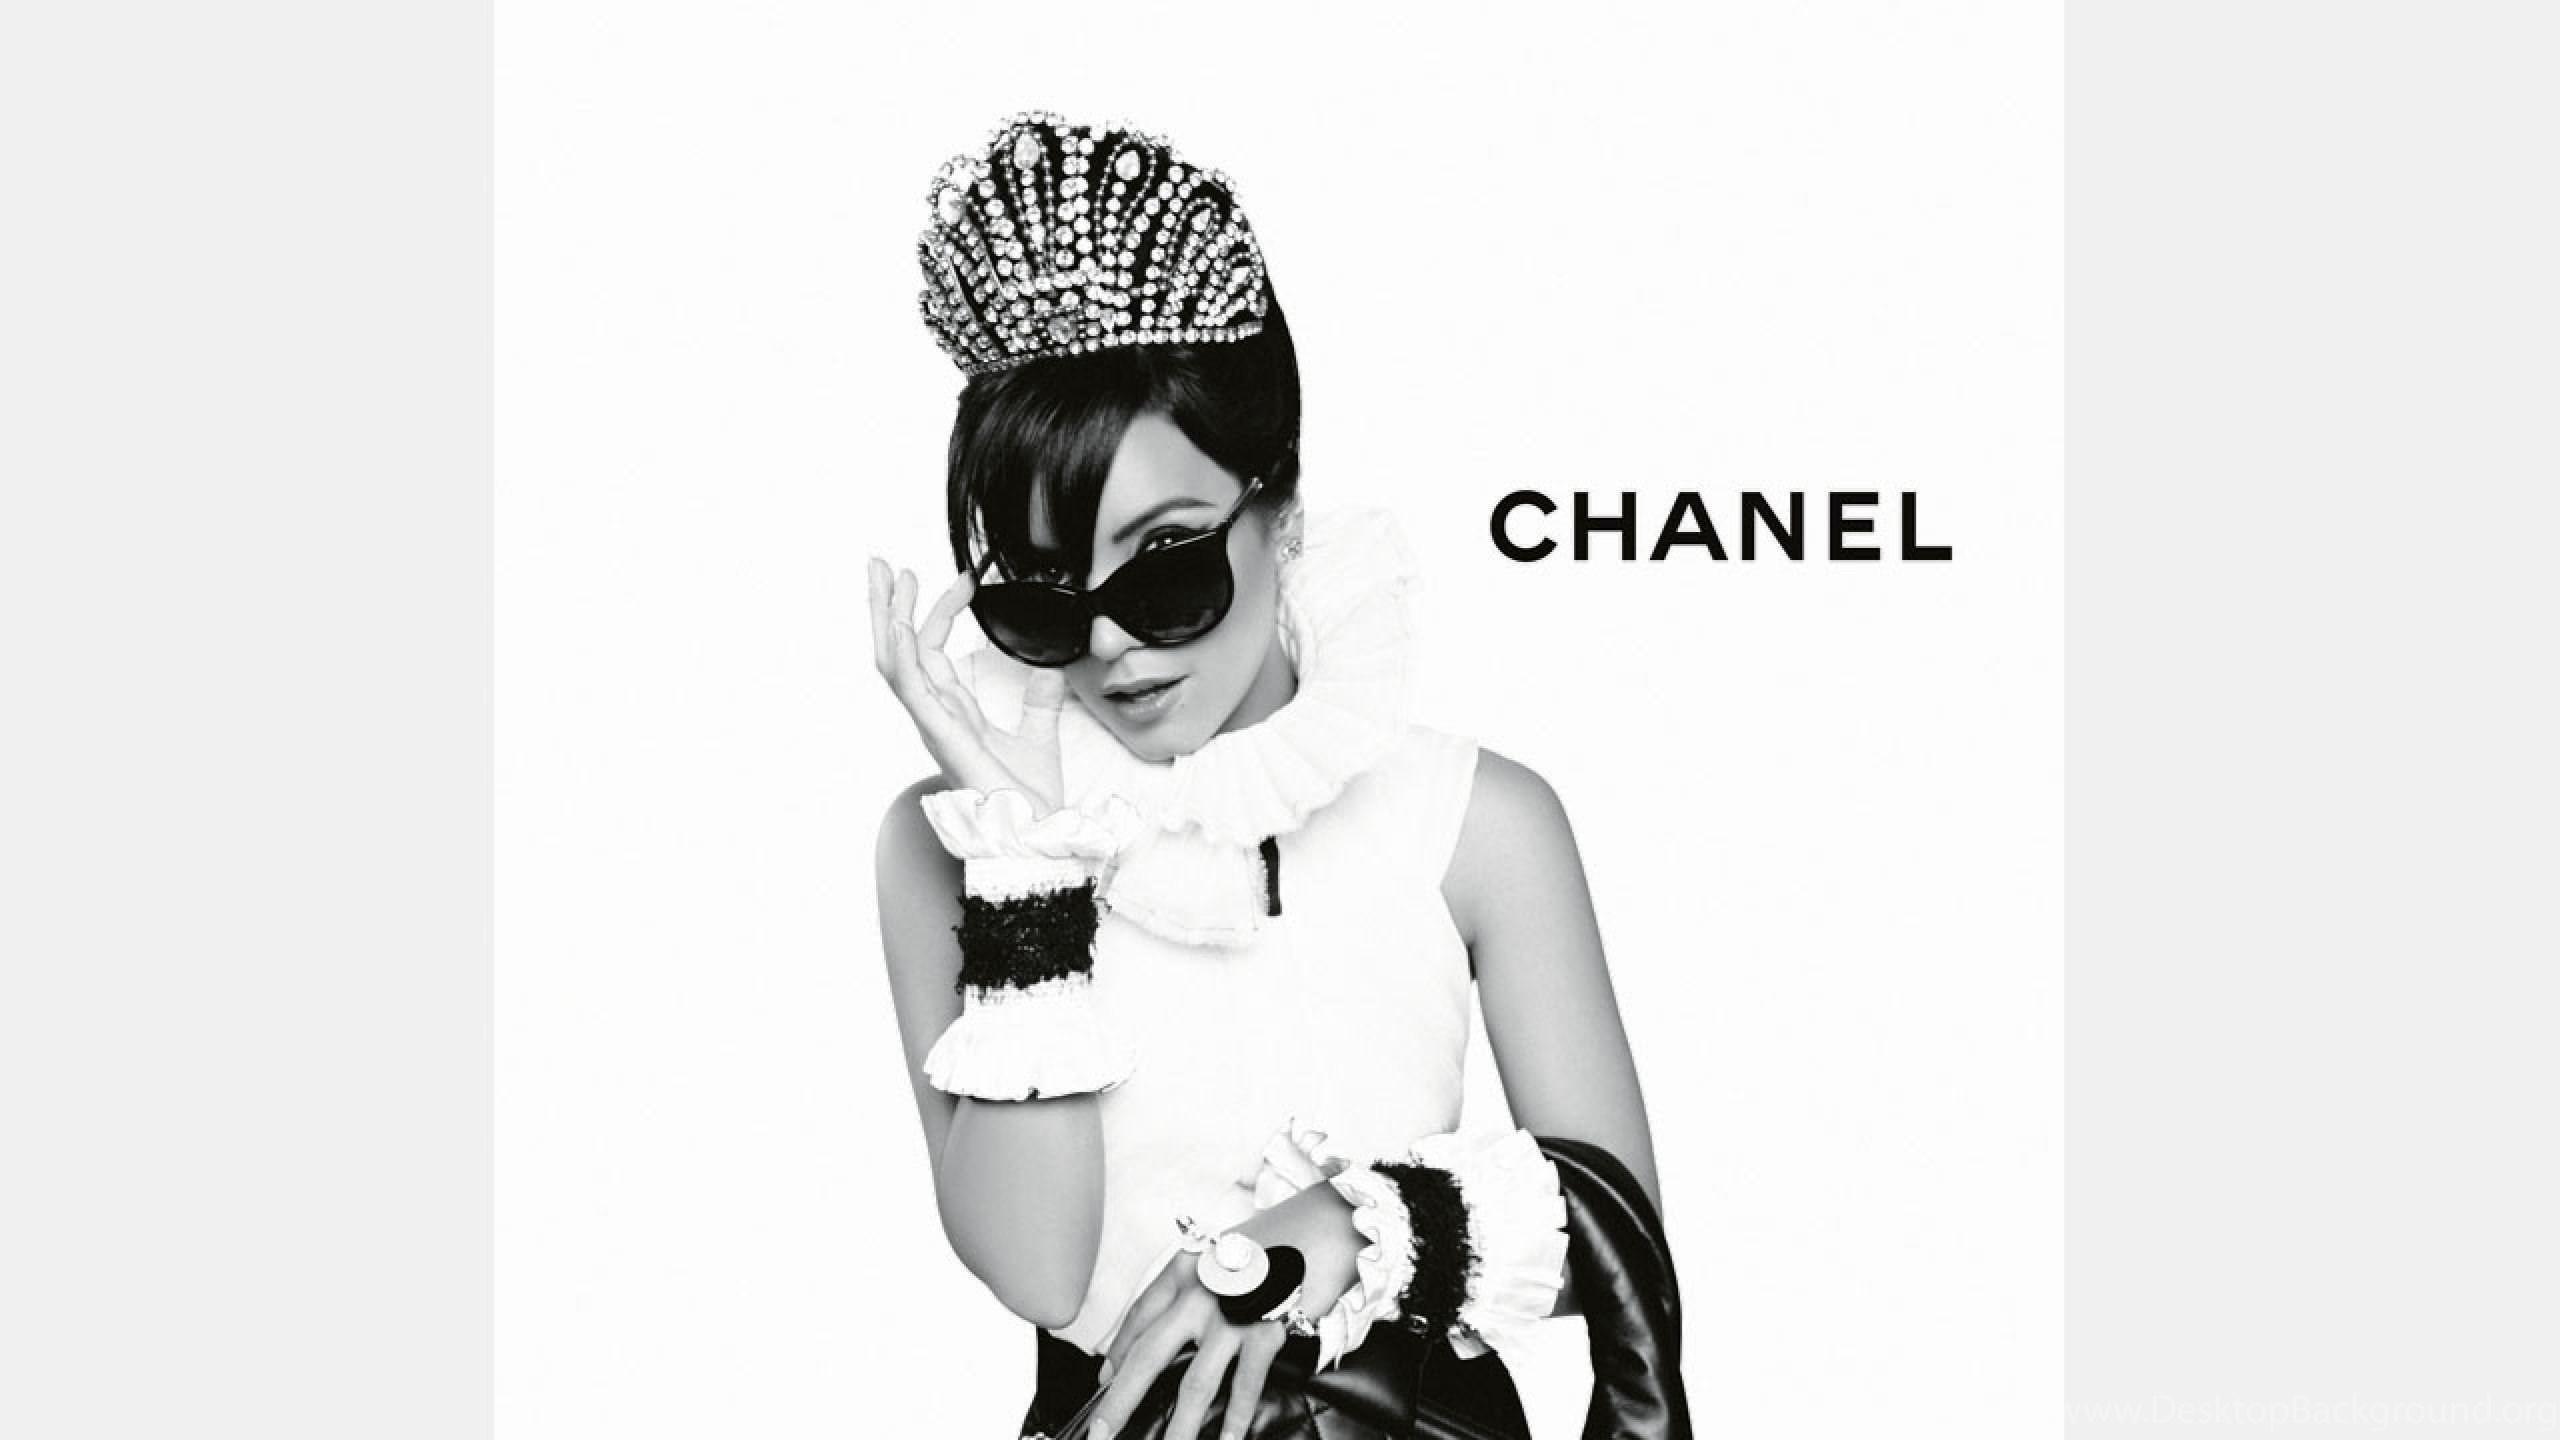 Mac IMac 27 Chanel Wallpapers HD Desktop Backgrounds 2560x1440